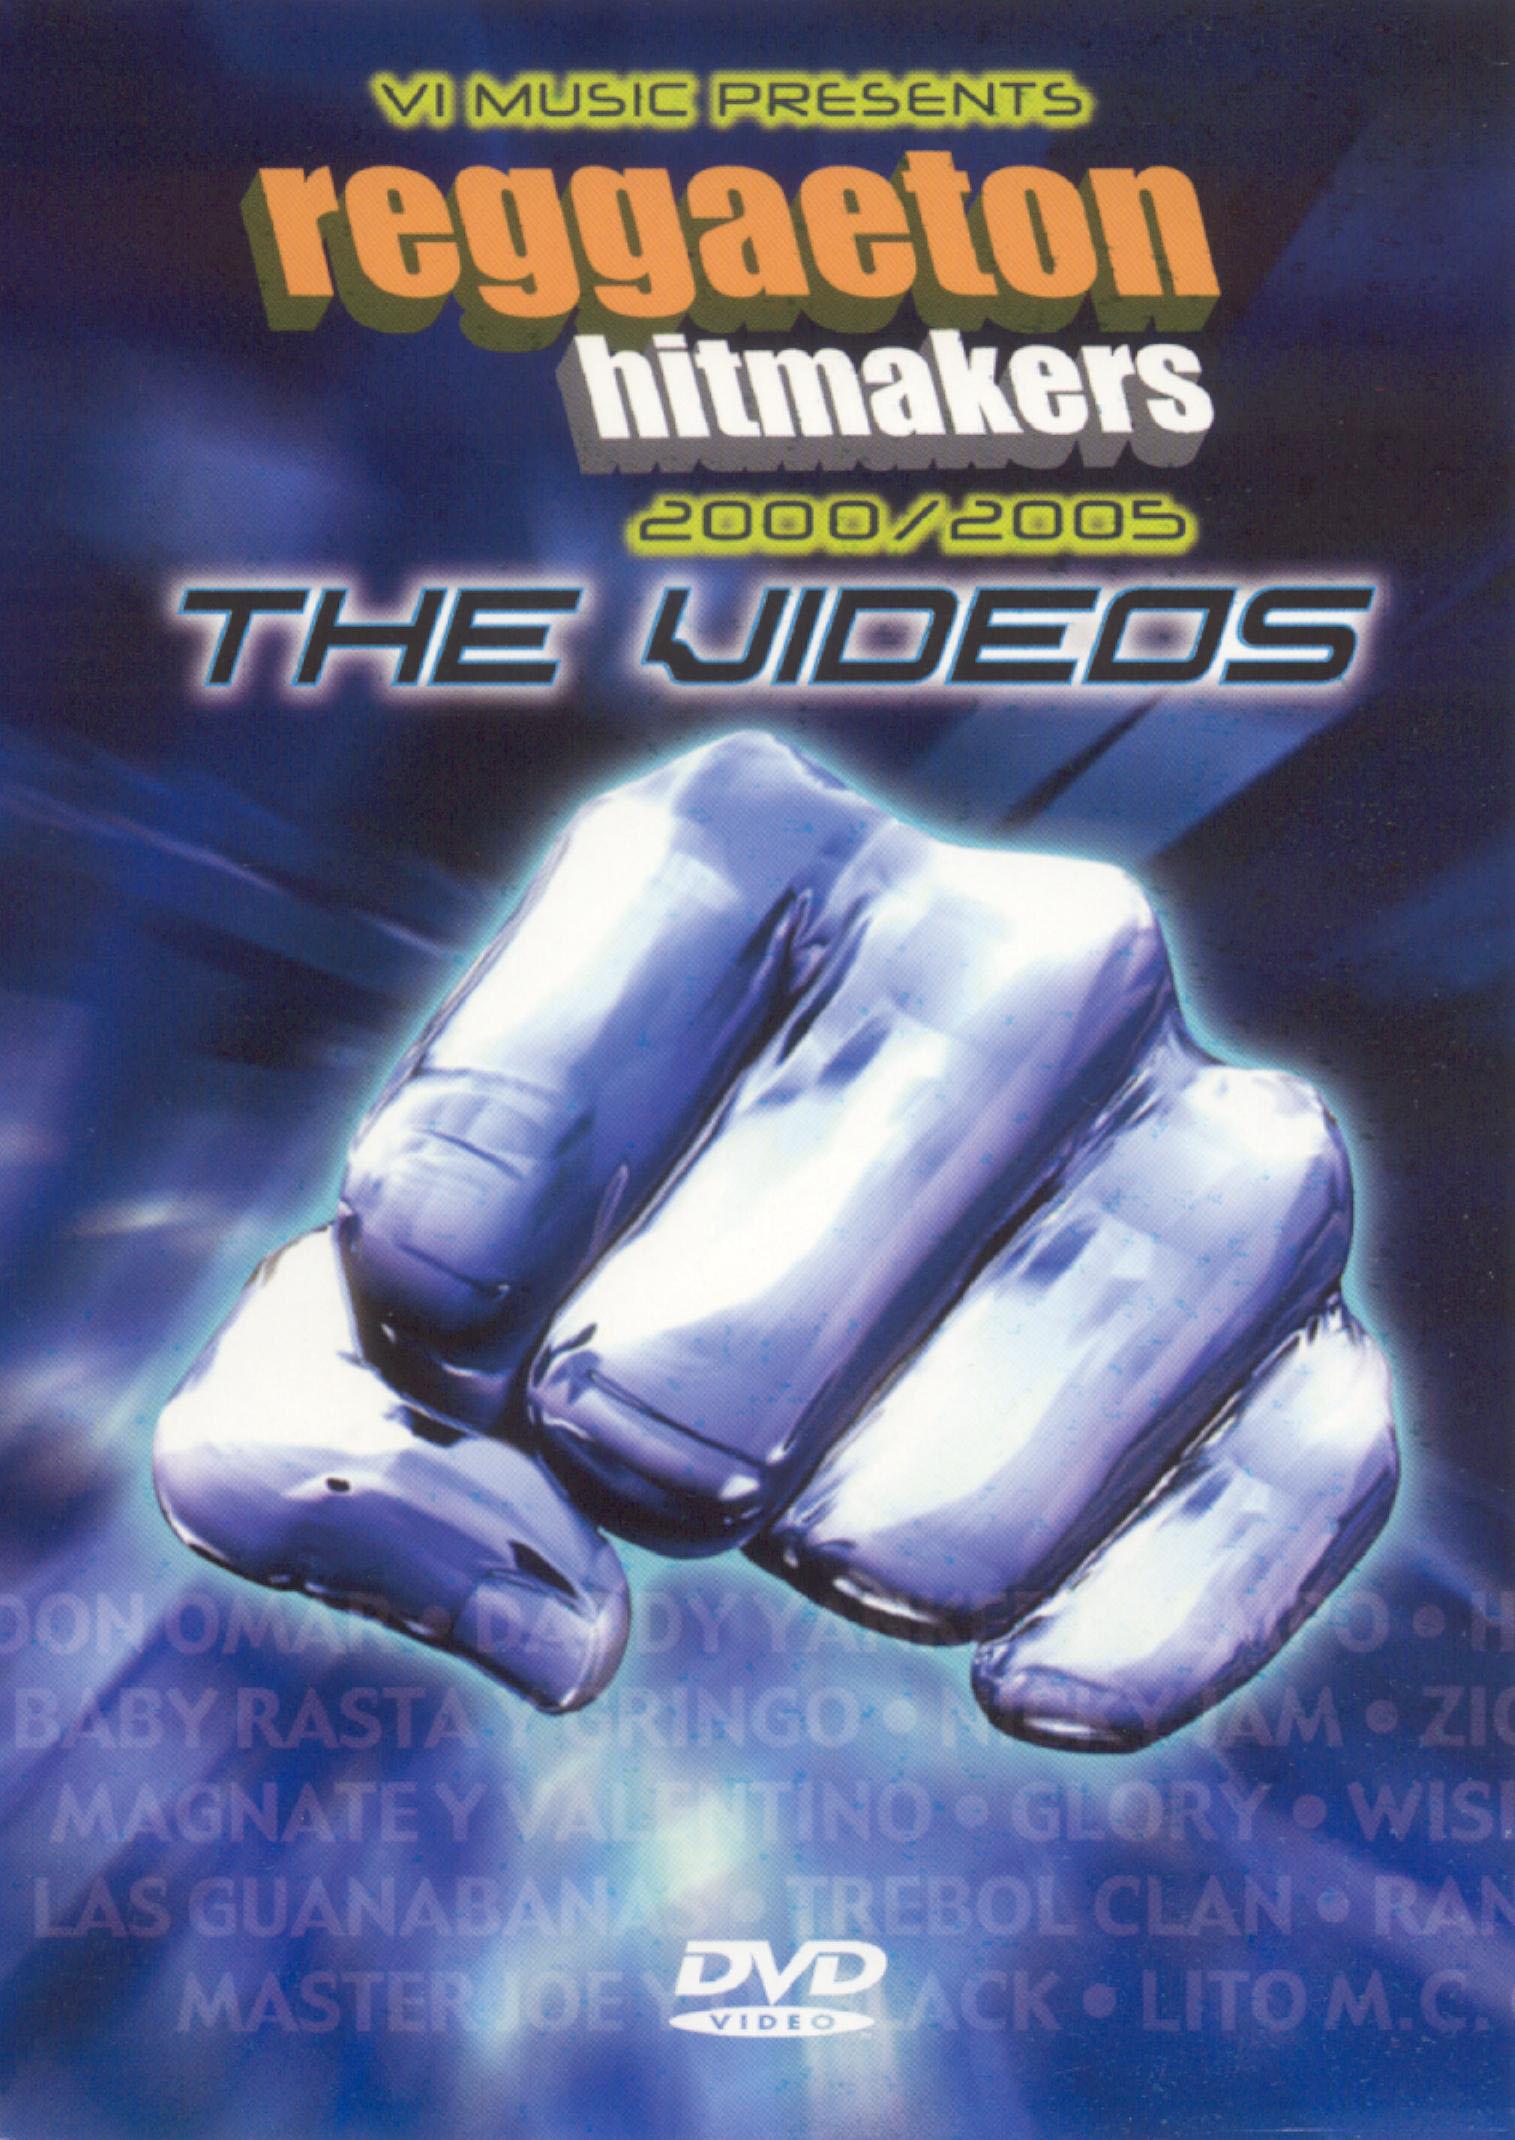 Reggaeton Hitmakers 2000/2005: The Videos